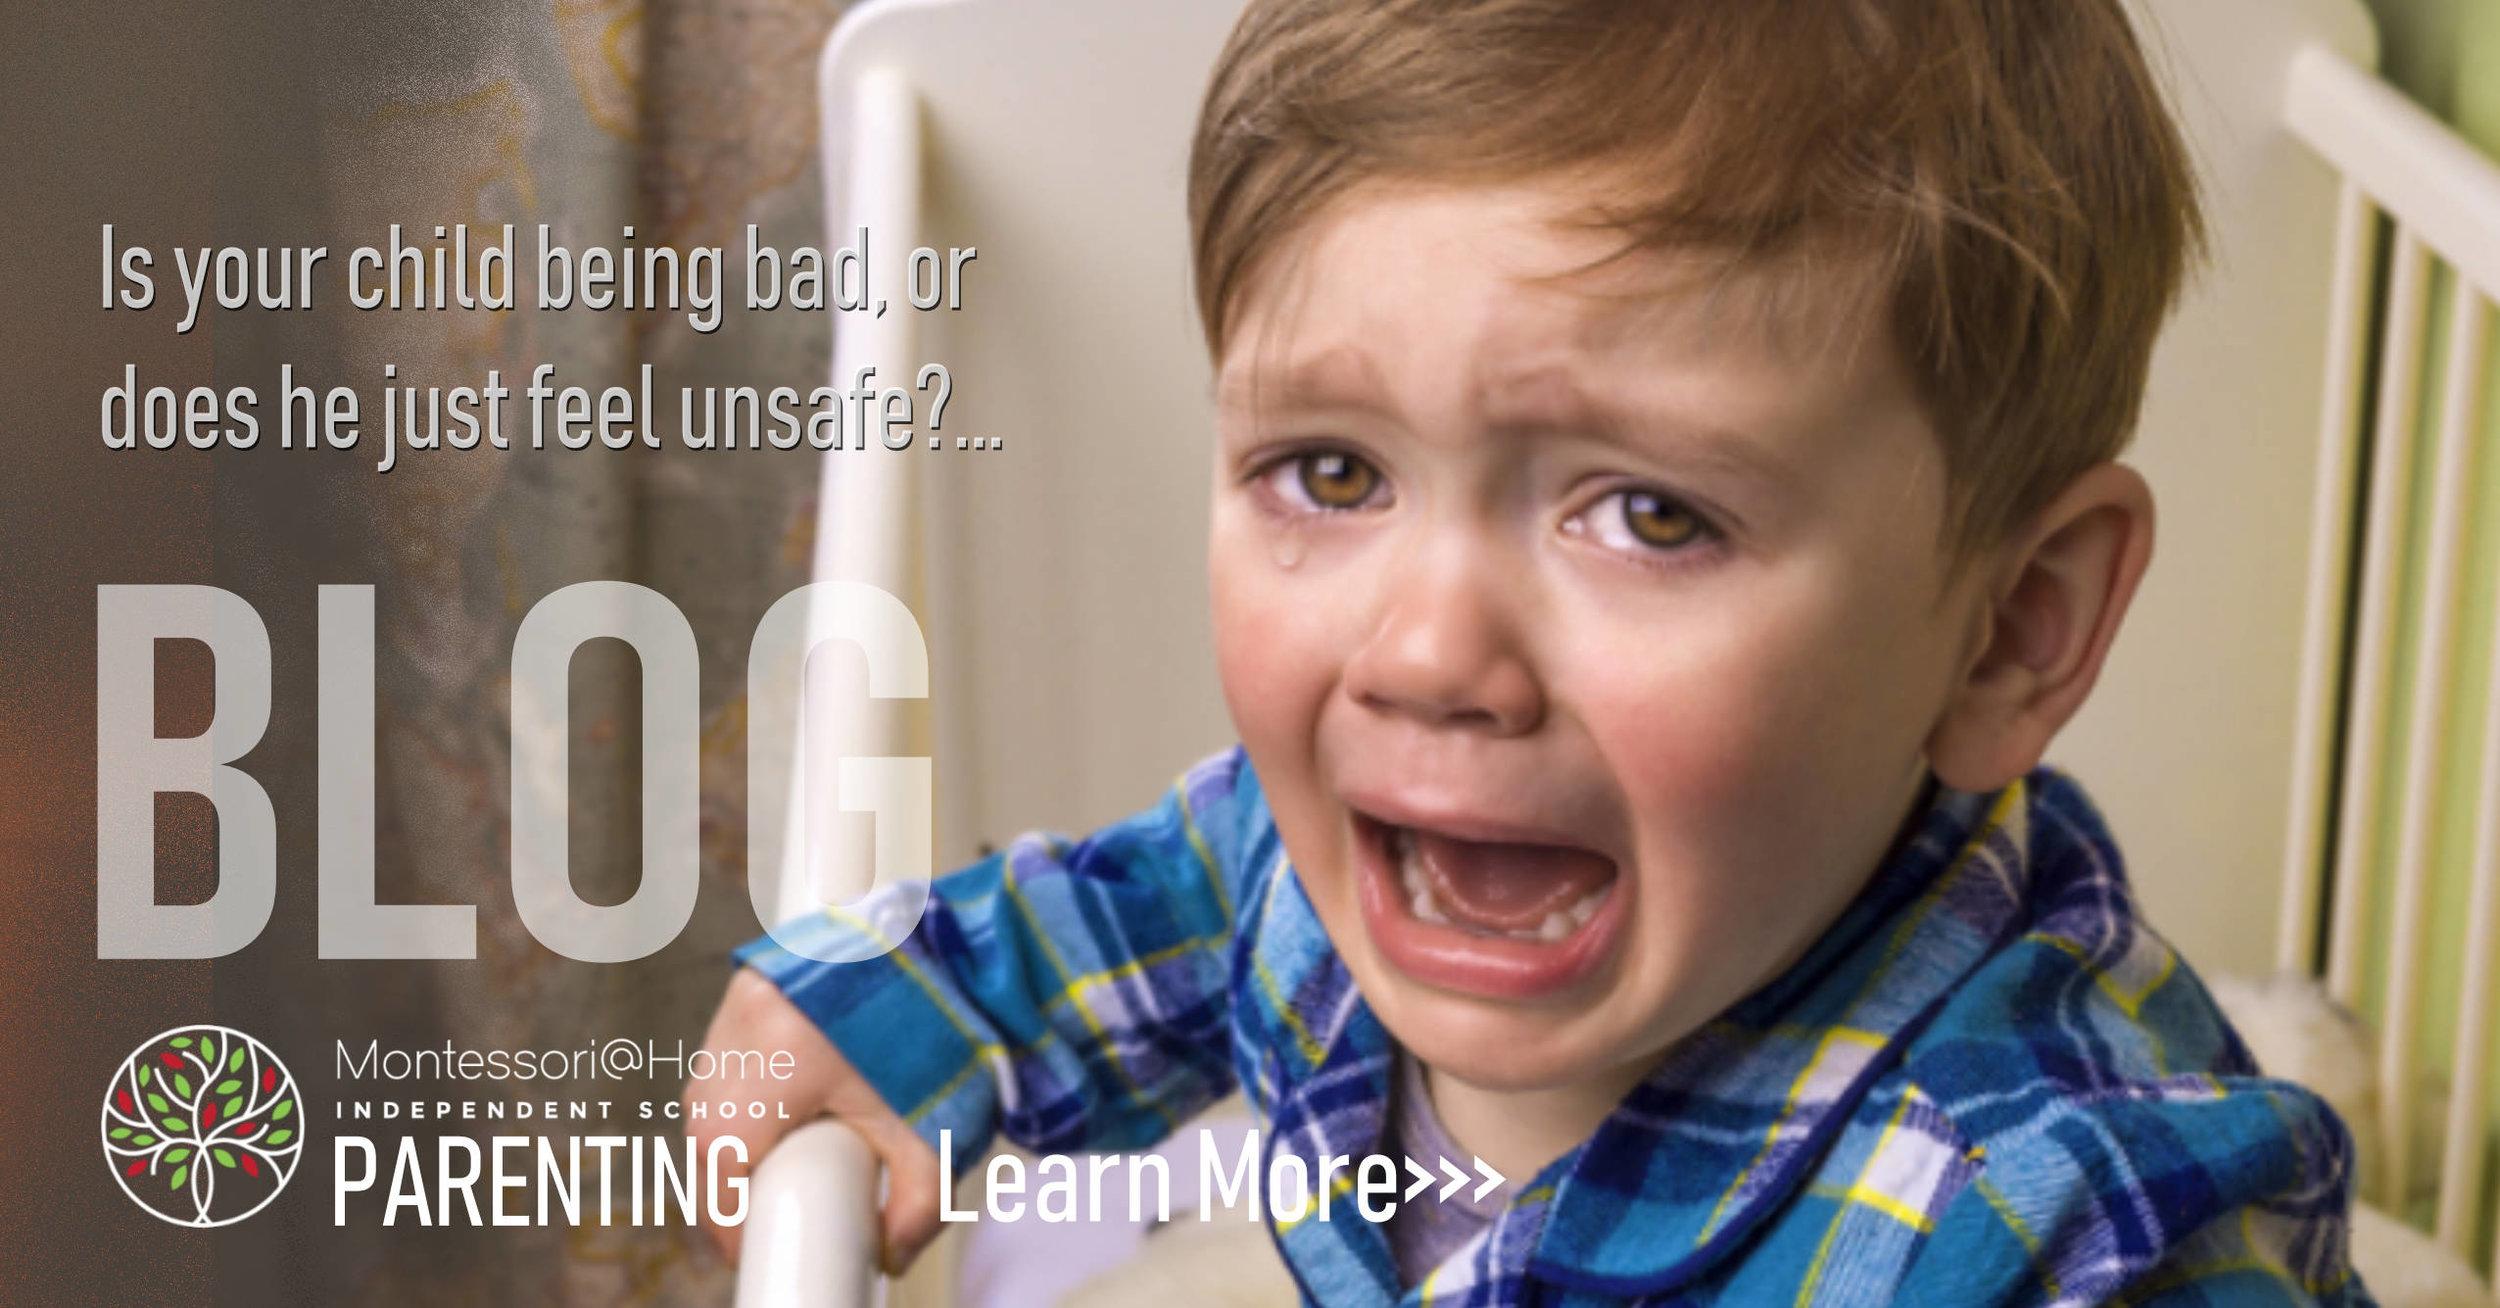 Montessori at home marketing unsafe blog thumbnail  learn more.jpg